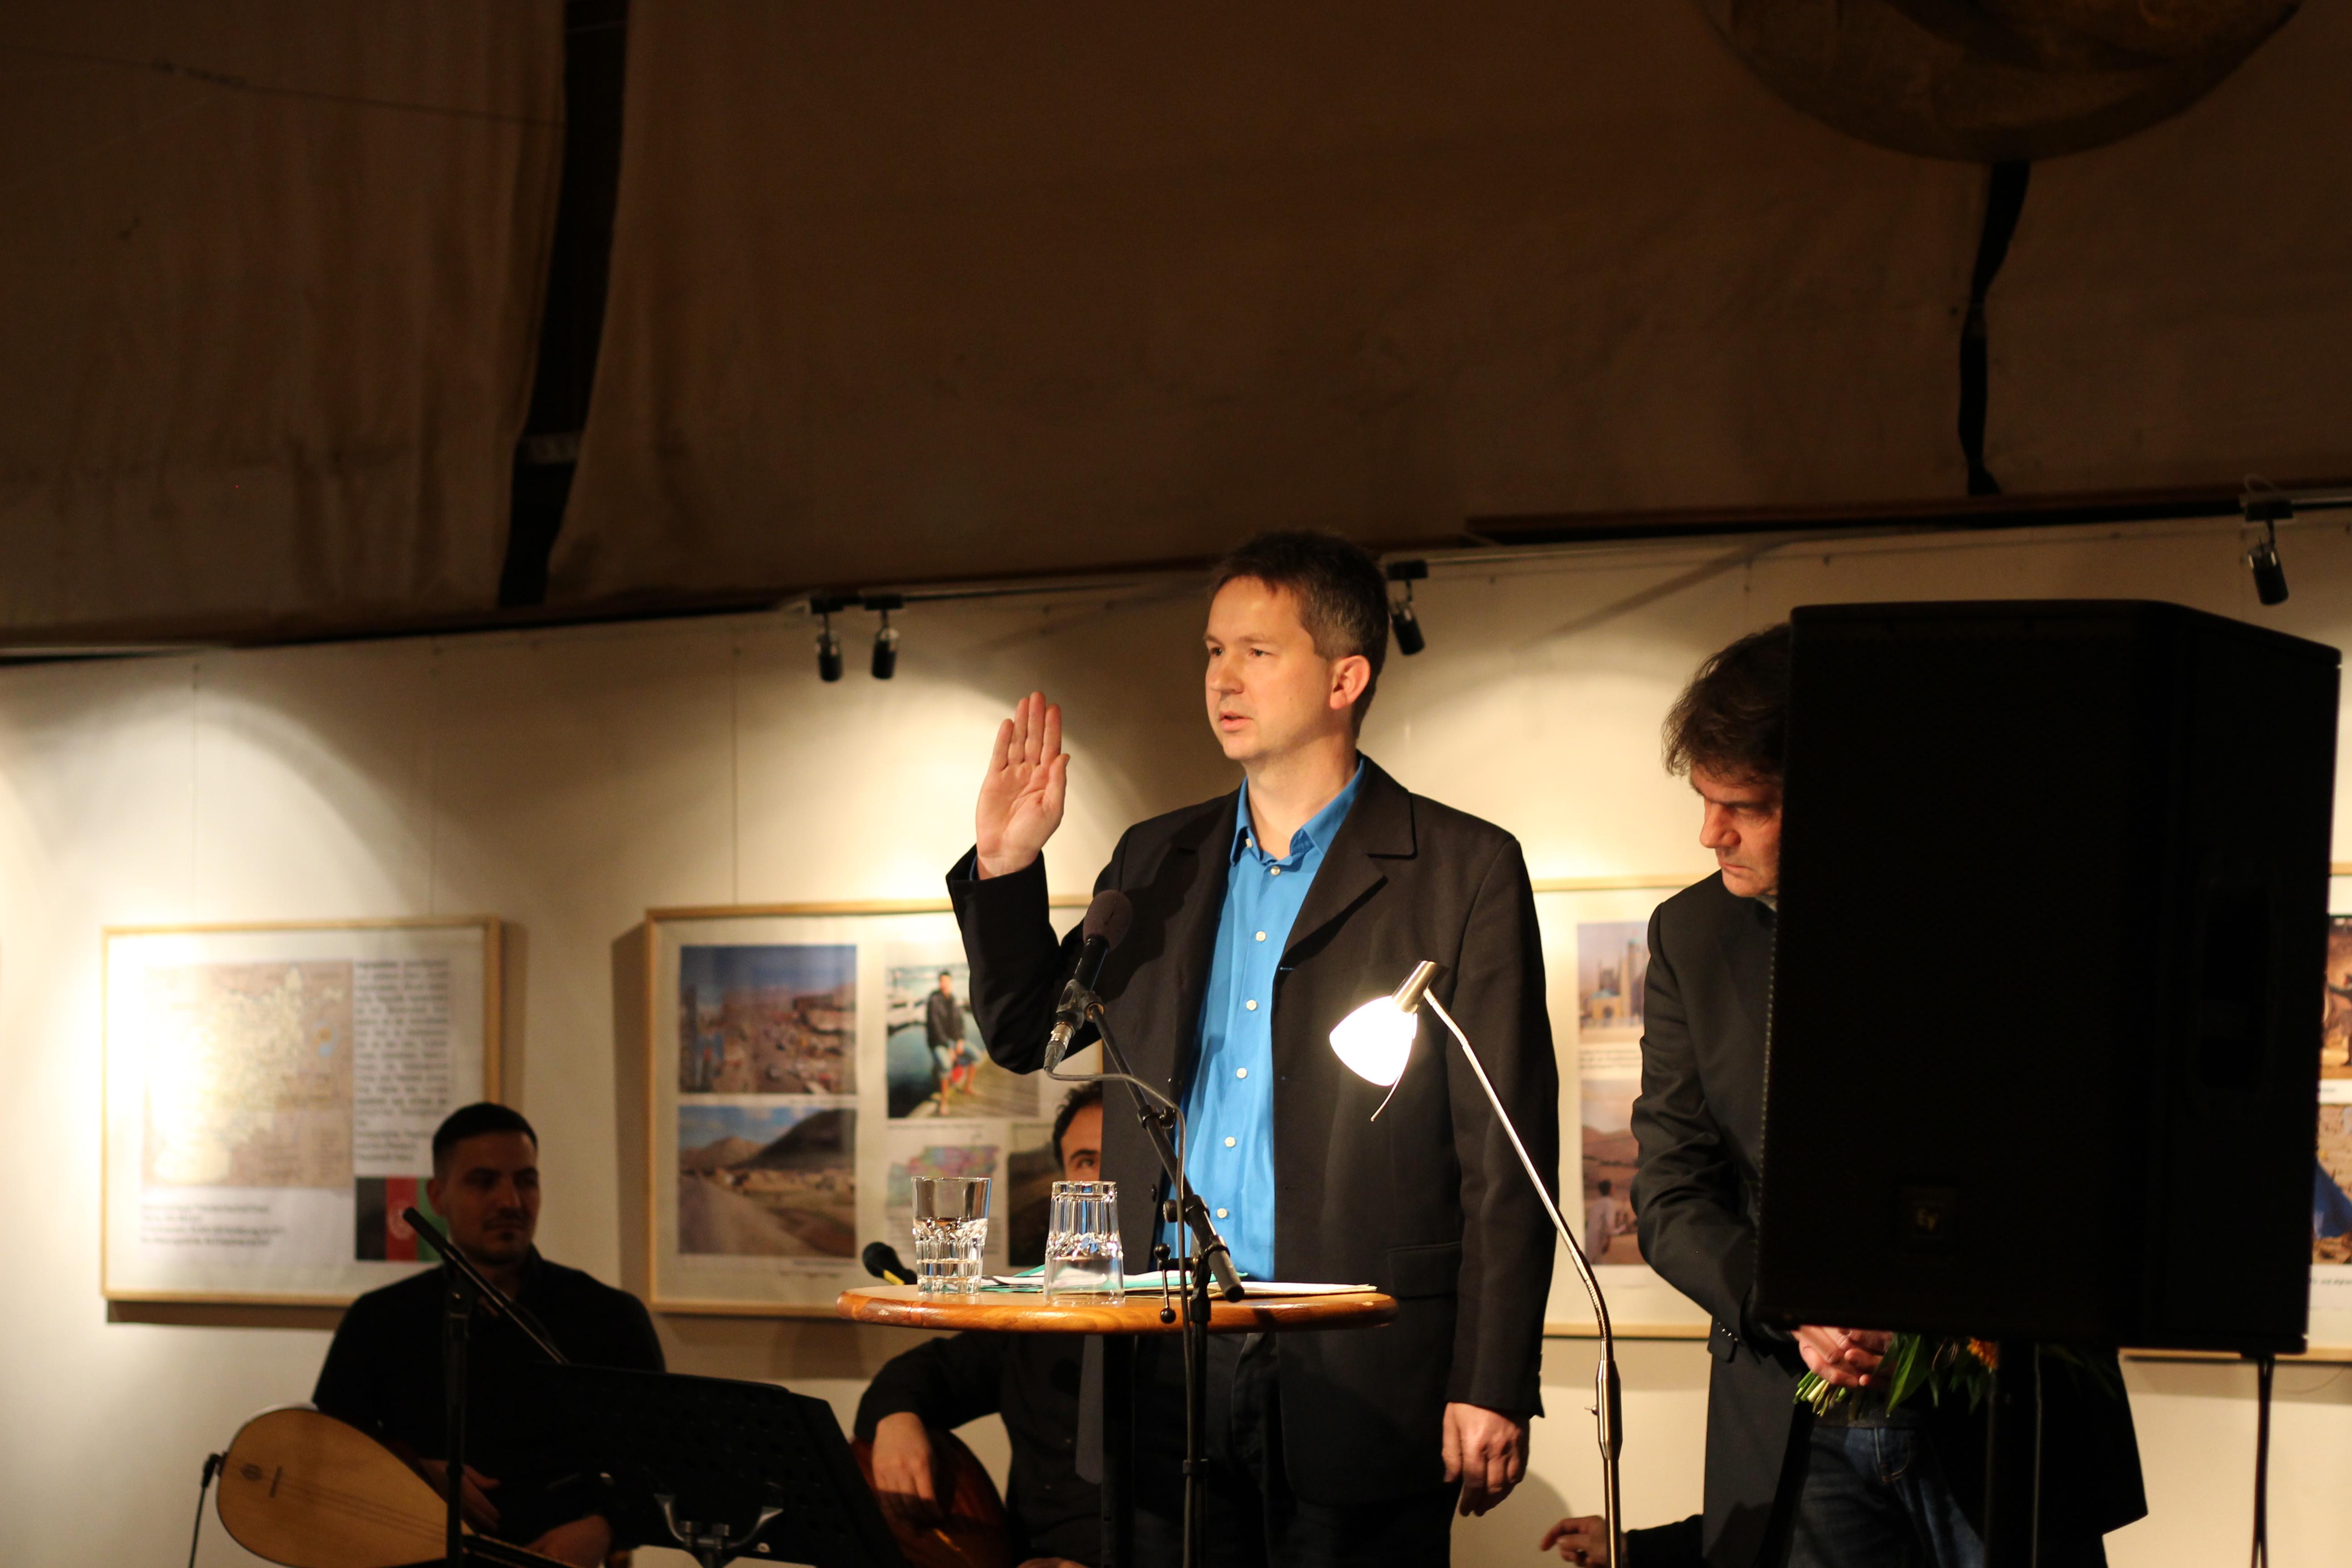 Neujahrsempfang: Steinbrück legt Amtseid ab